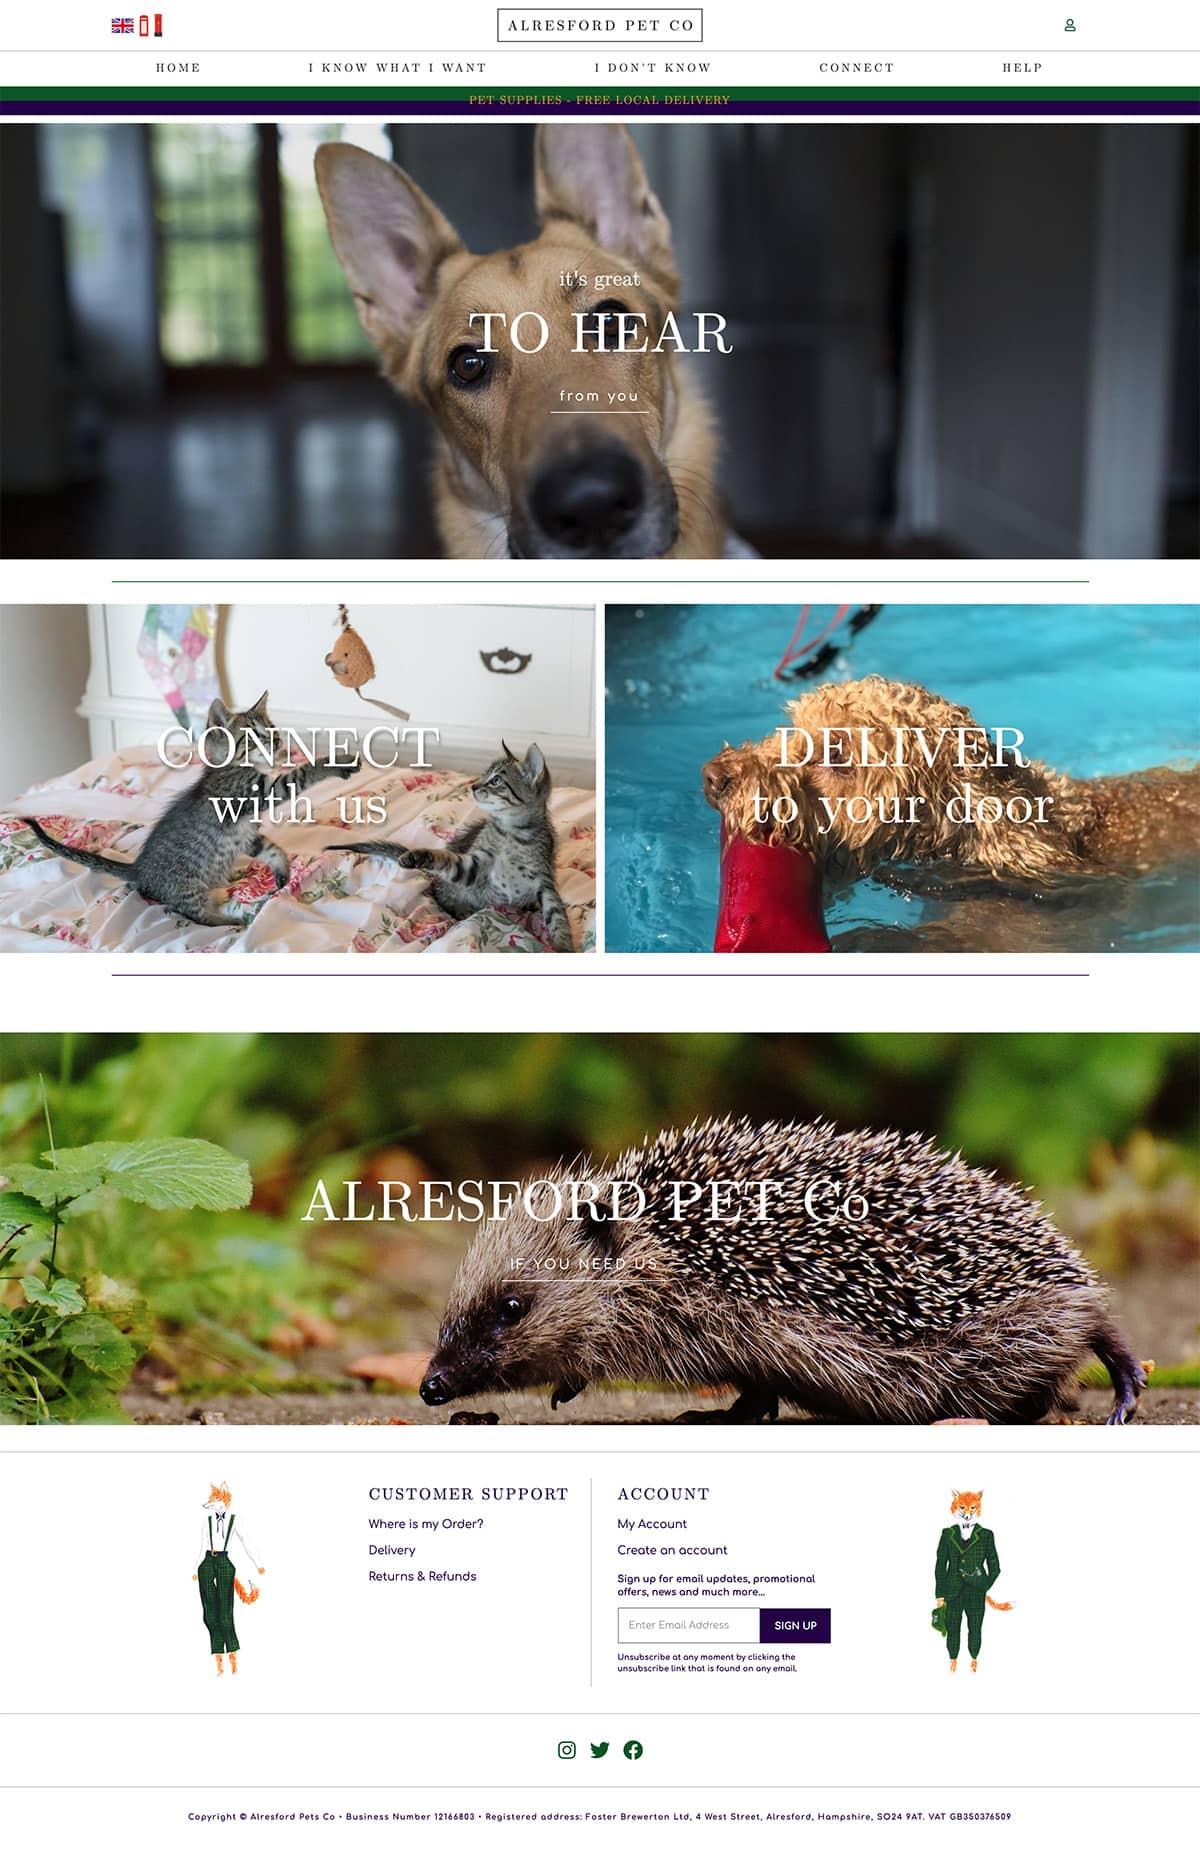 Alresford Pets